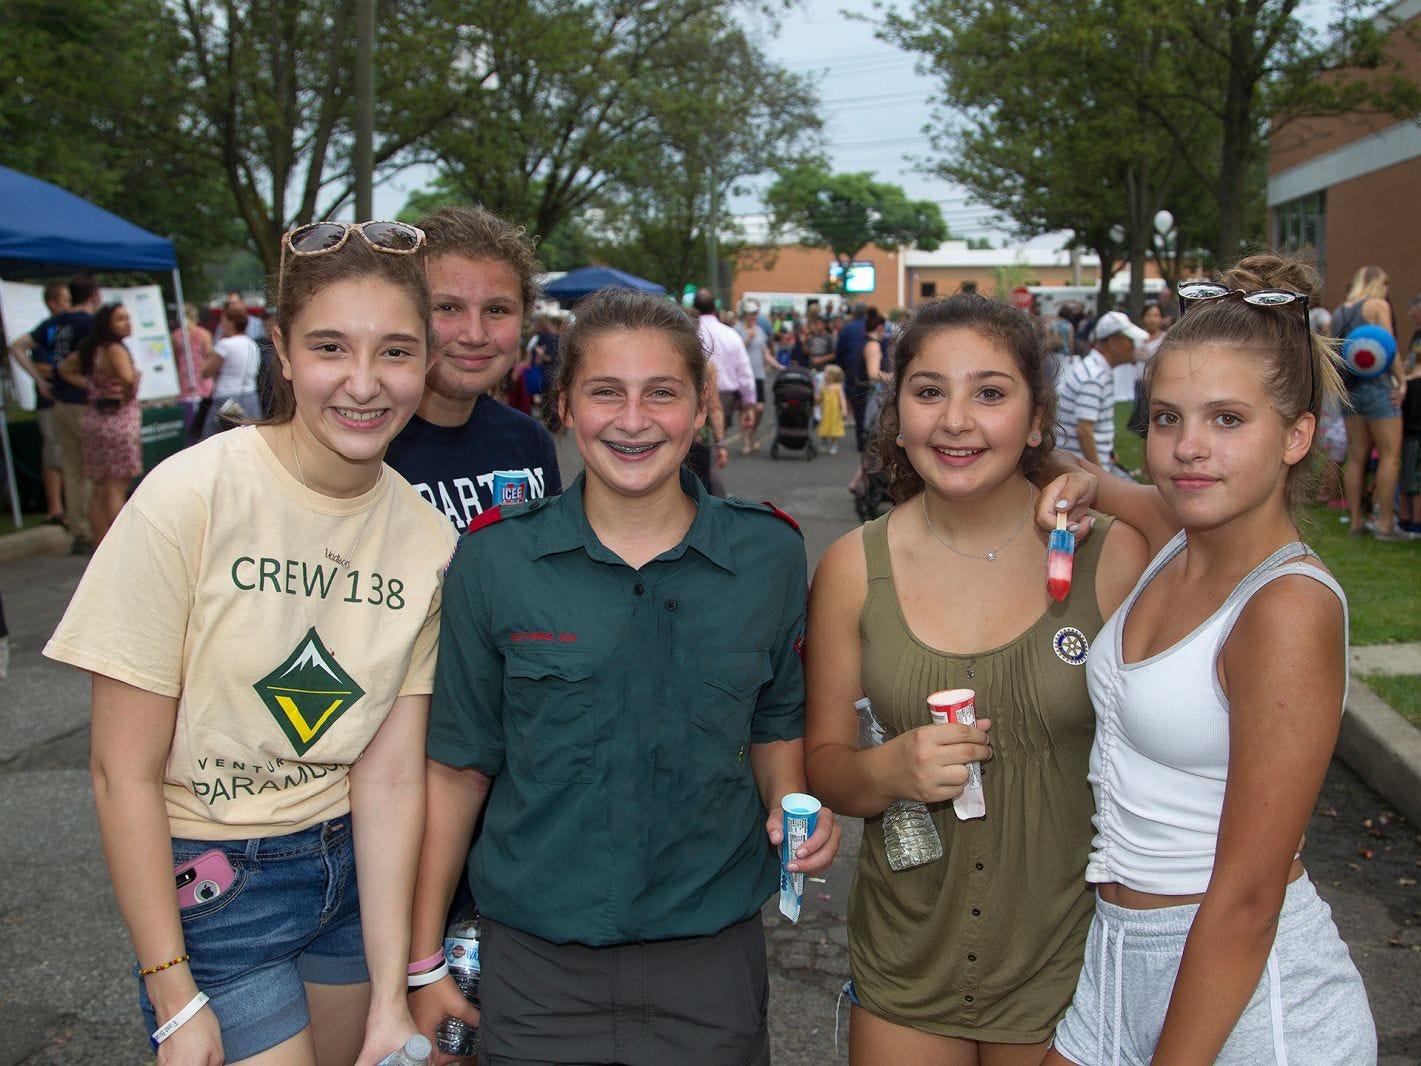 Madison, Ashley, Raelin, Angelique, Mya. Paramus National Night Out 2018 behind Paramus Library. 08/07/2018